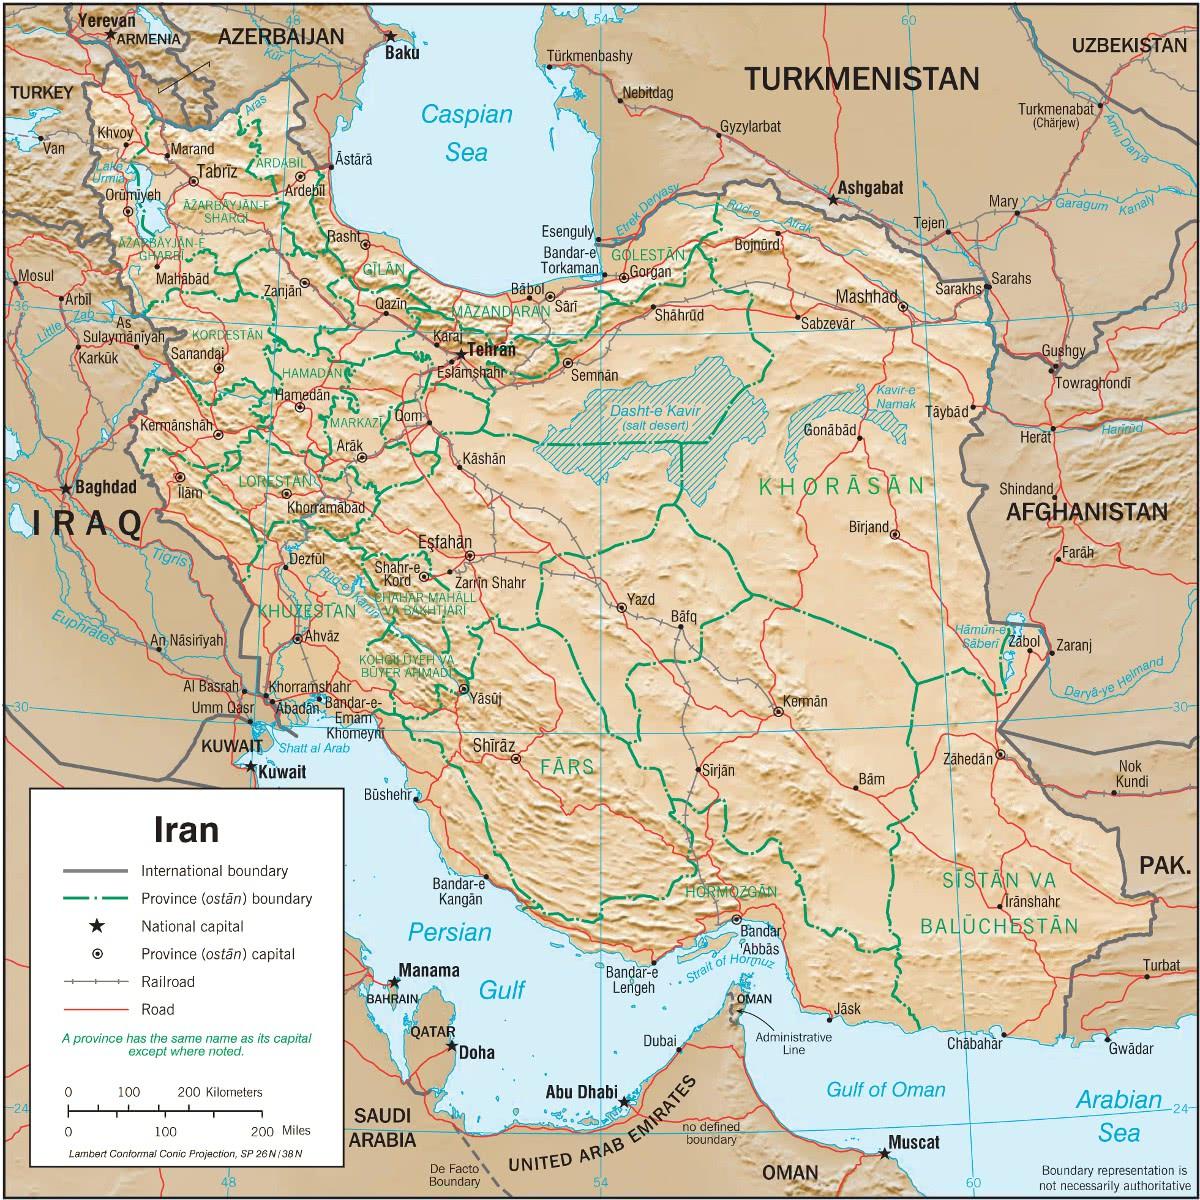 Iran relief map 2001 geographycountrymapsiiran iran relief map 2001 geographycountrymapsiiraniranreliefmap2001gml gumiabroncs Images